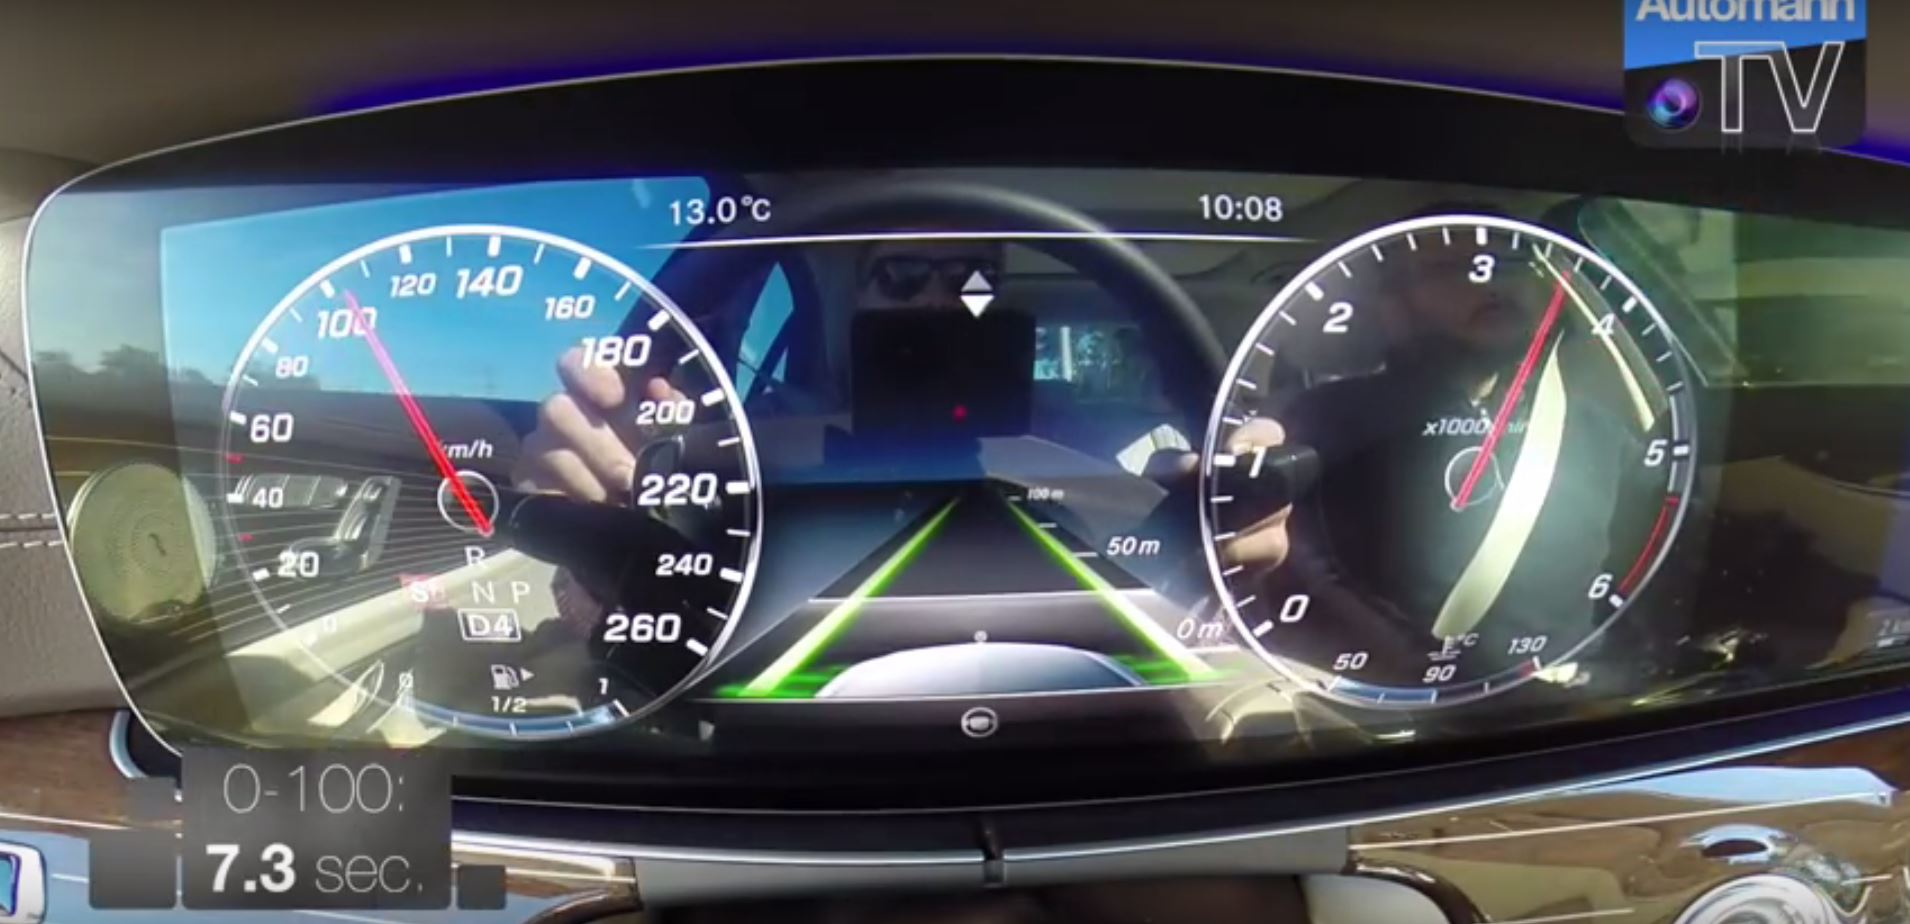 2017 Mercedes E 220d Acceleration Test Shows New 2 0-Liter